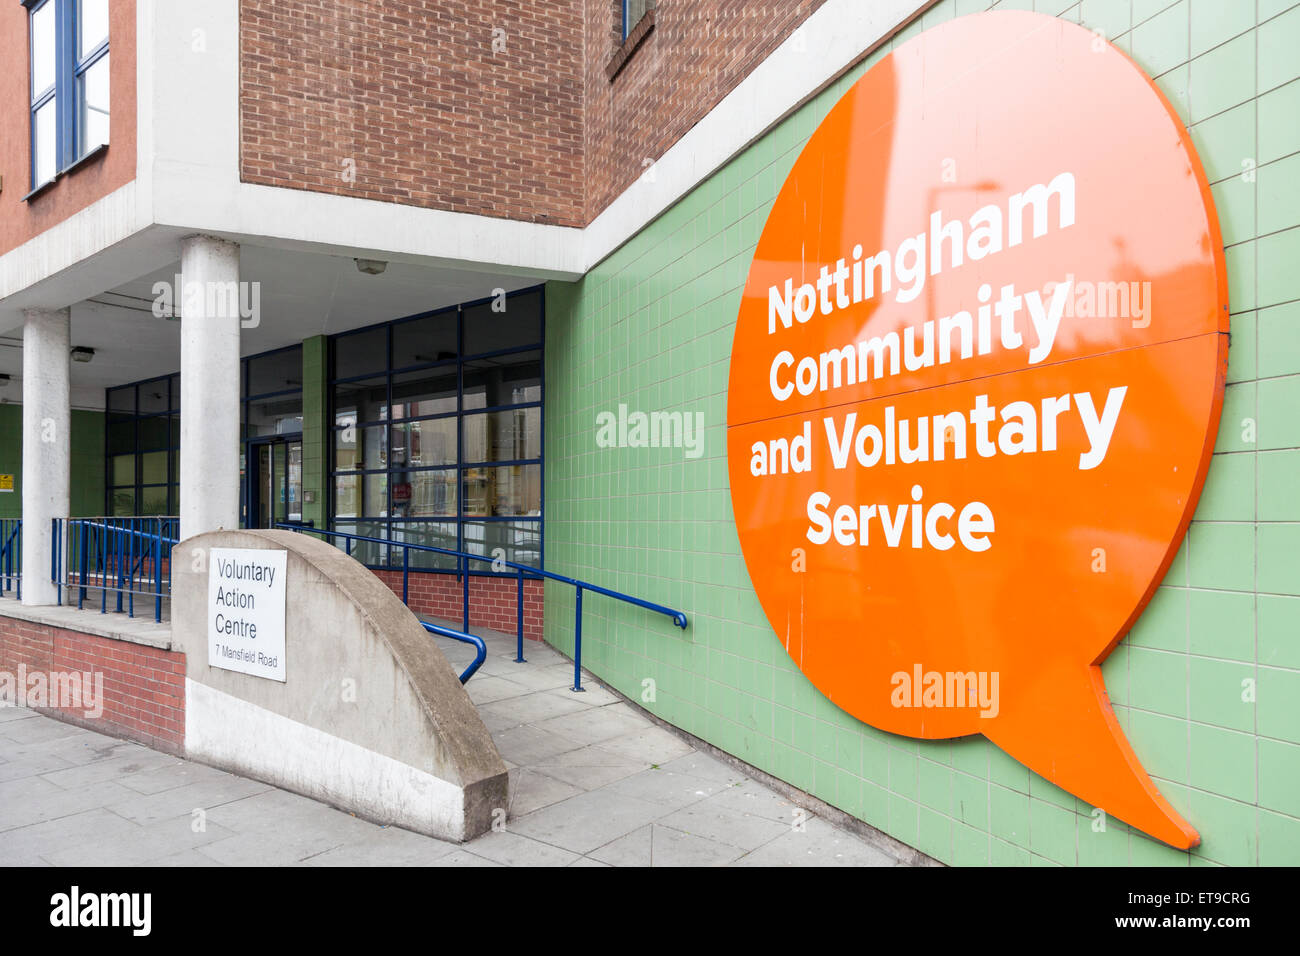 Nottingham Community and Voluntary Service, Voluntary Action Centre, Nottingham, England, UK - Stock Image